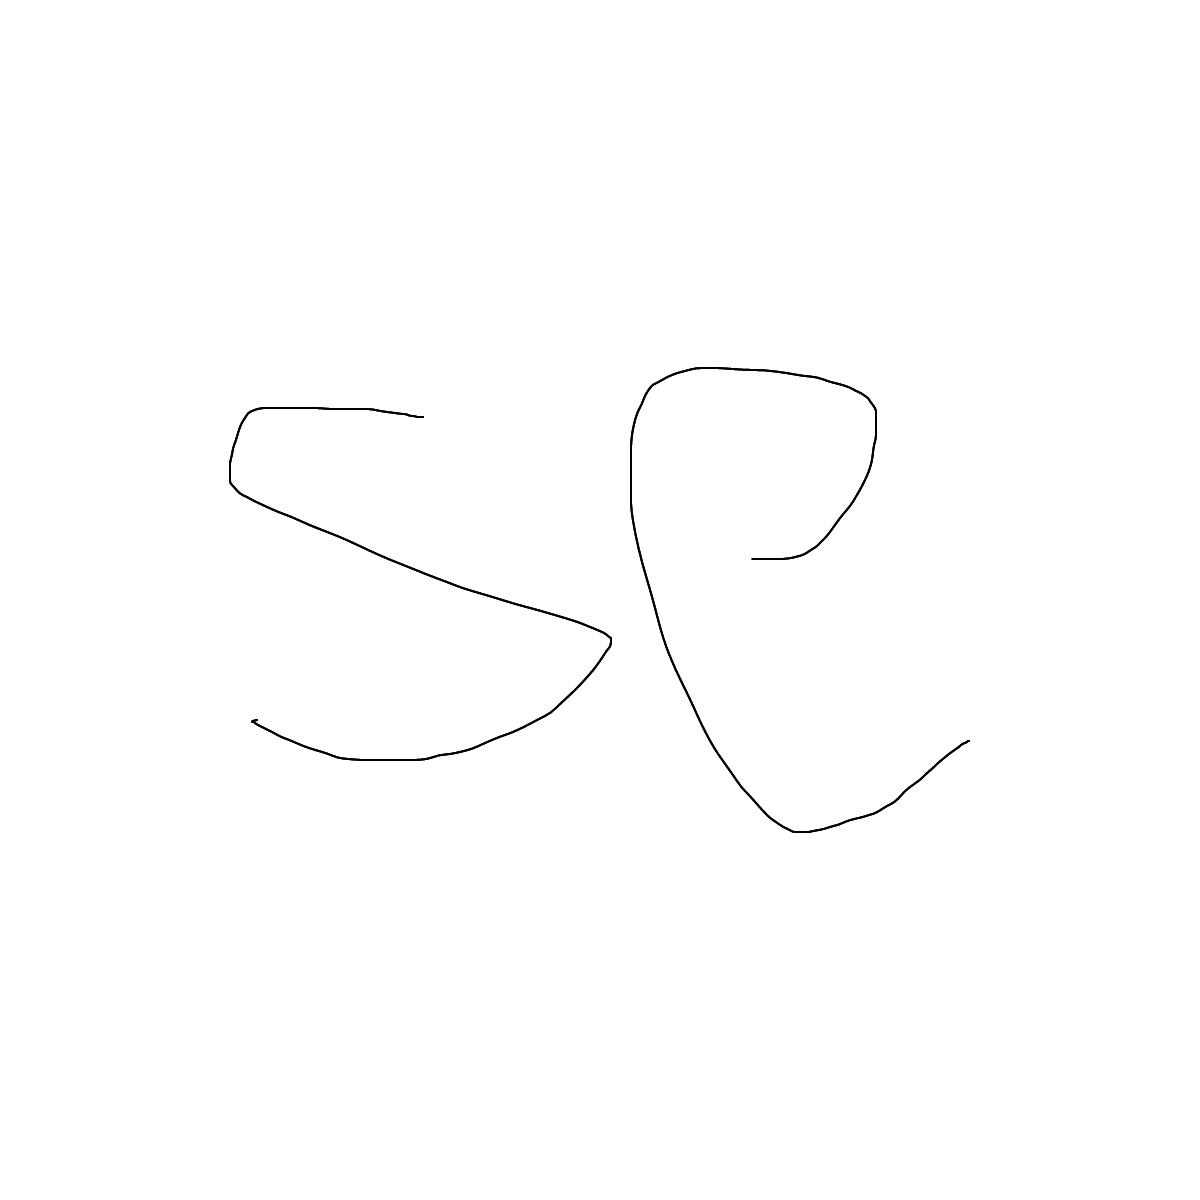 BAAAM drawing#20997 lat:51.9922828674316400lng: 5.8945631980896000